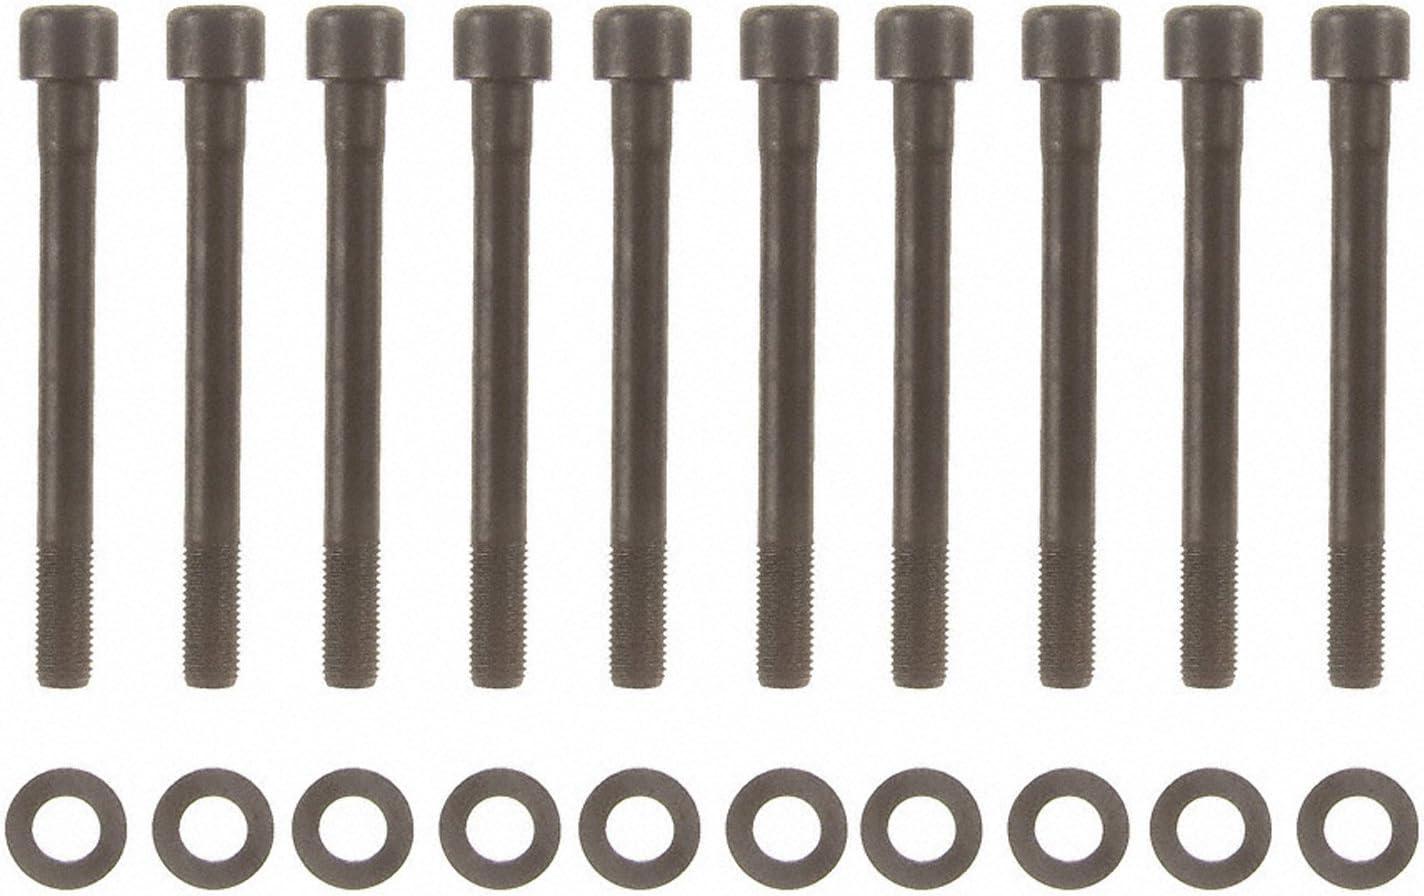 Engine Cylinder Head Bolt Set Fel-Pro ES 72249-2